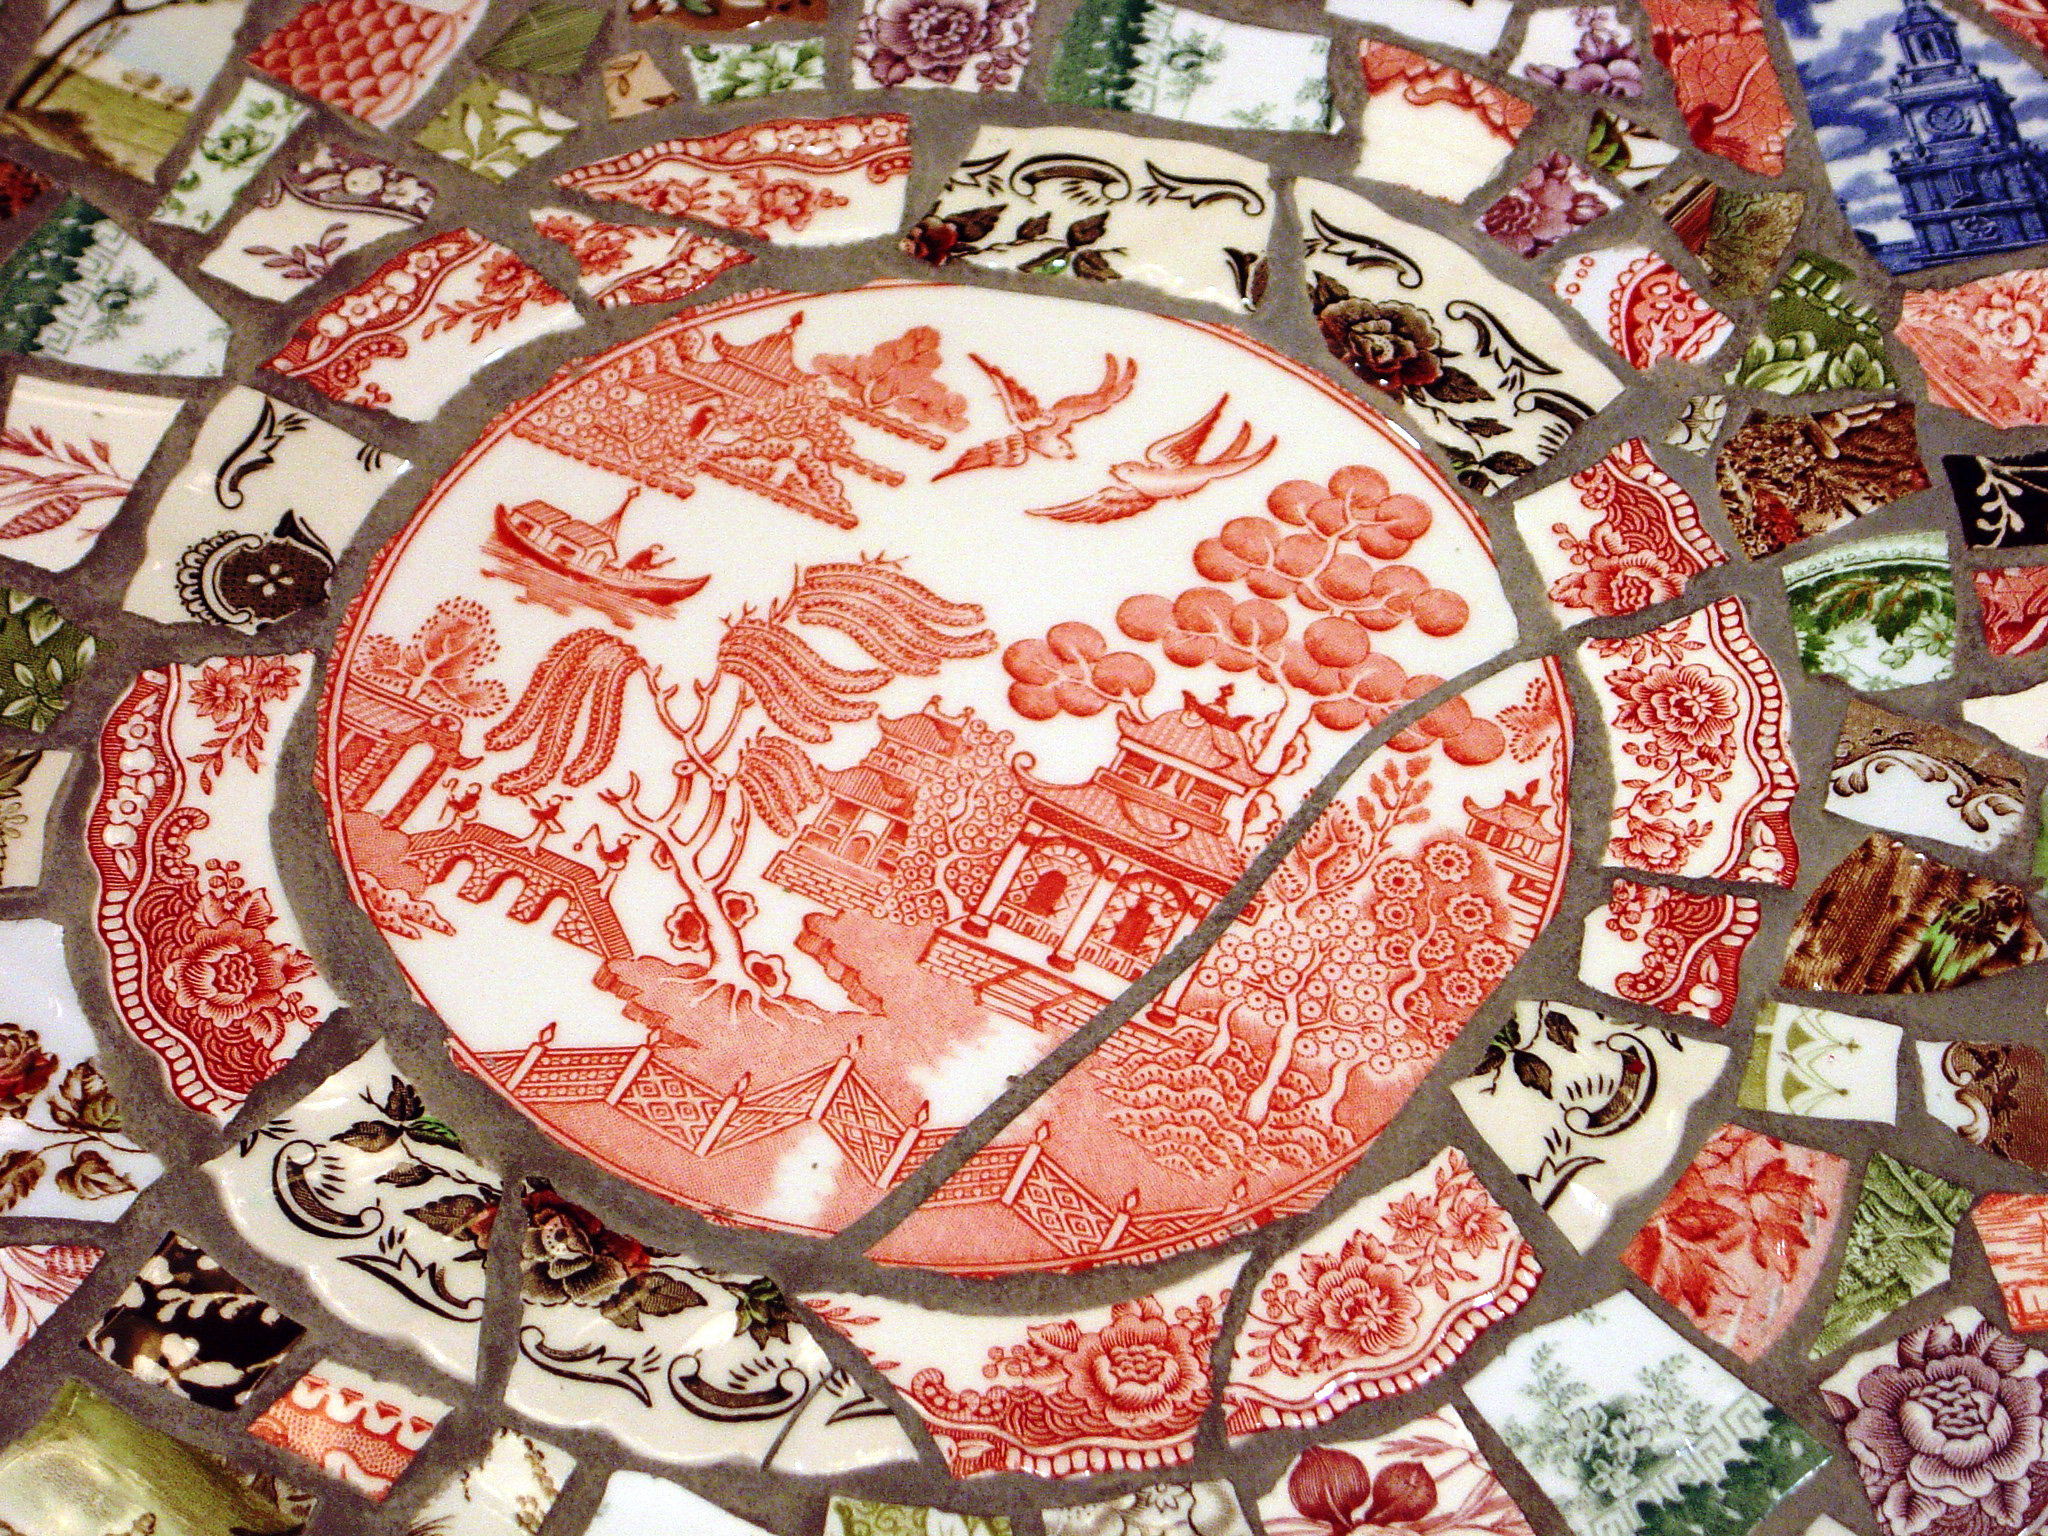 Custom-Mosaic-Table-2-DSC00104.jpg